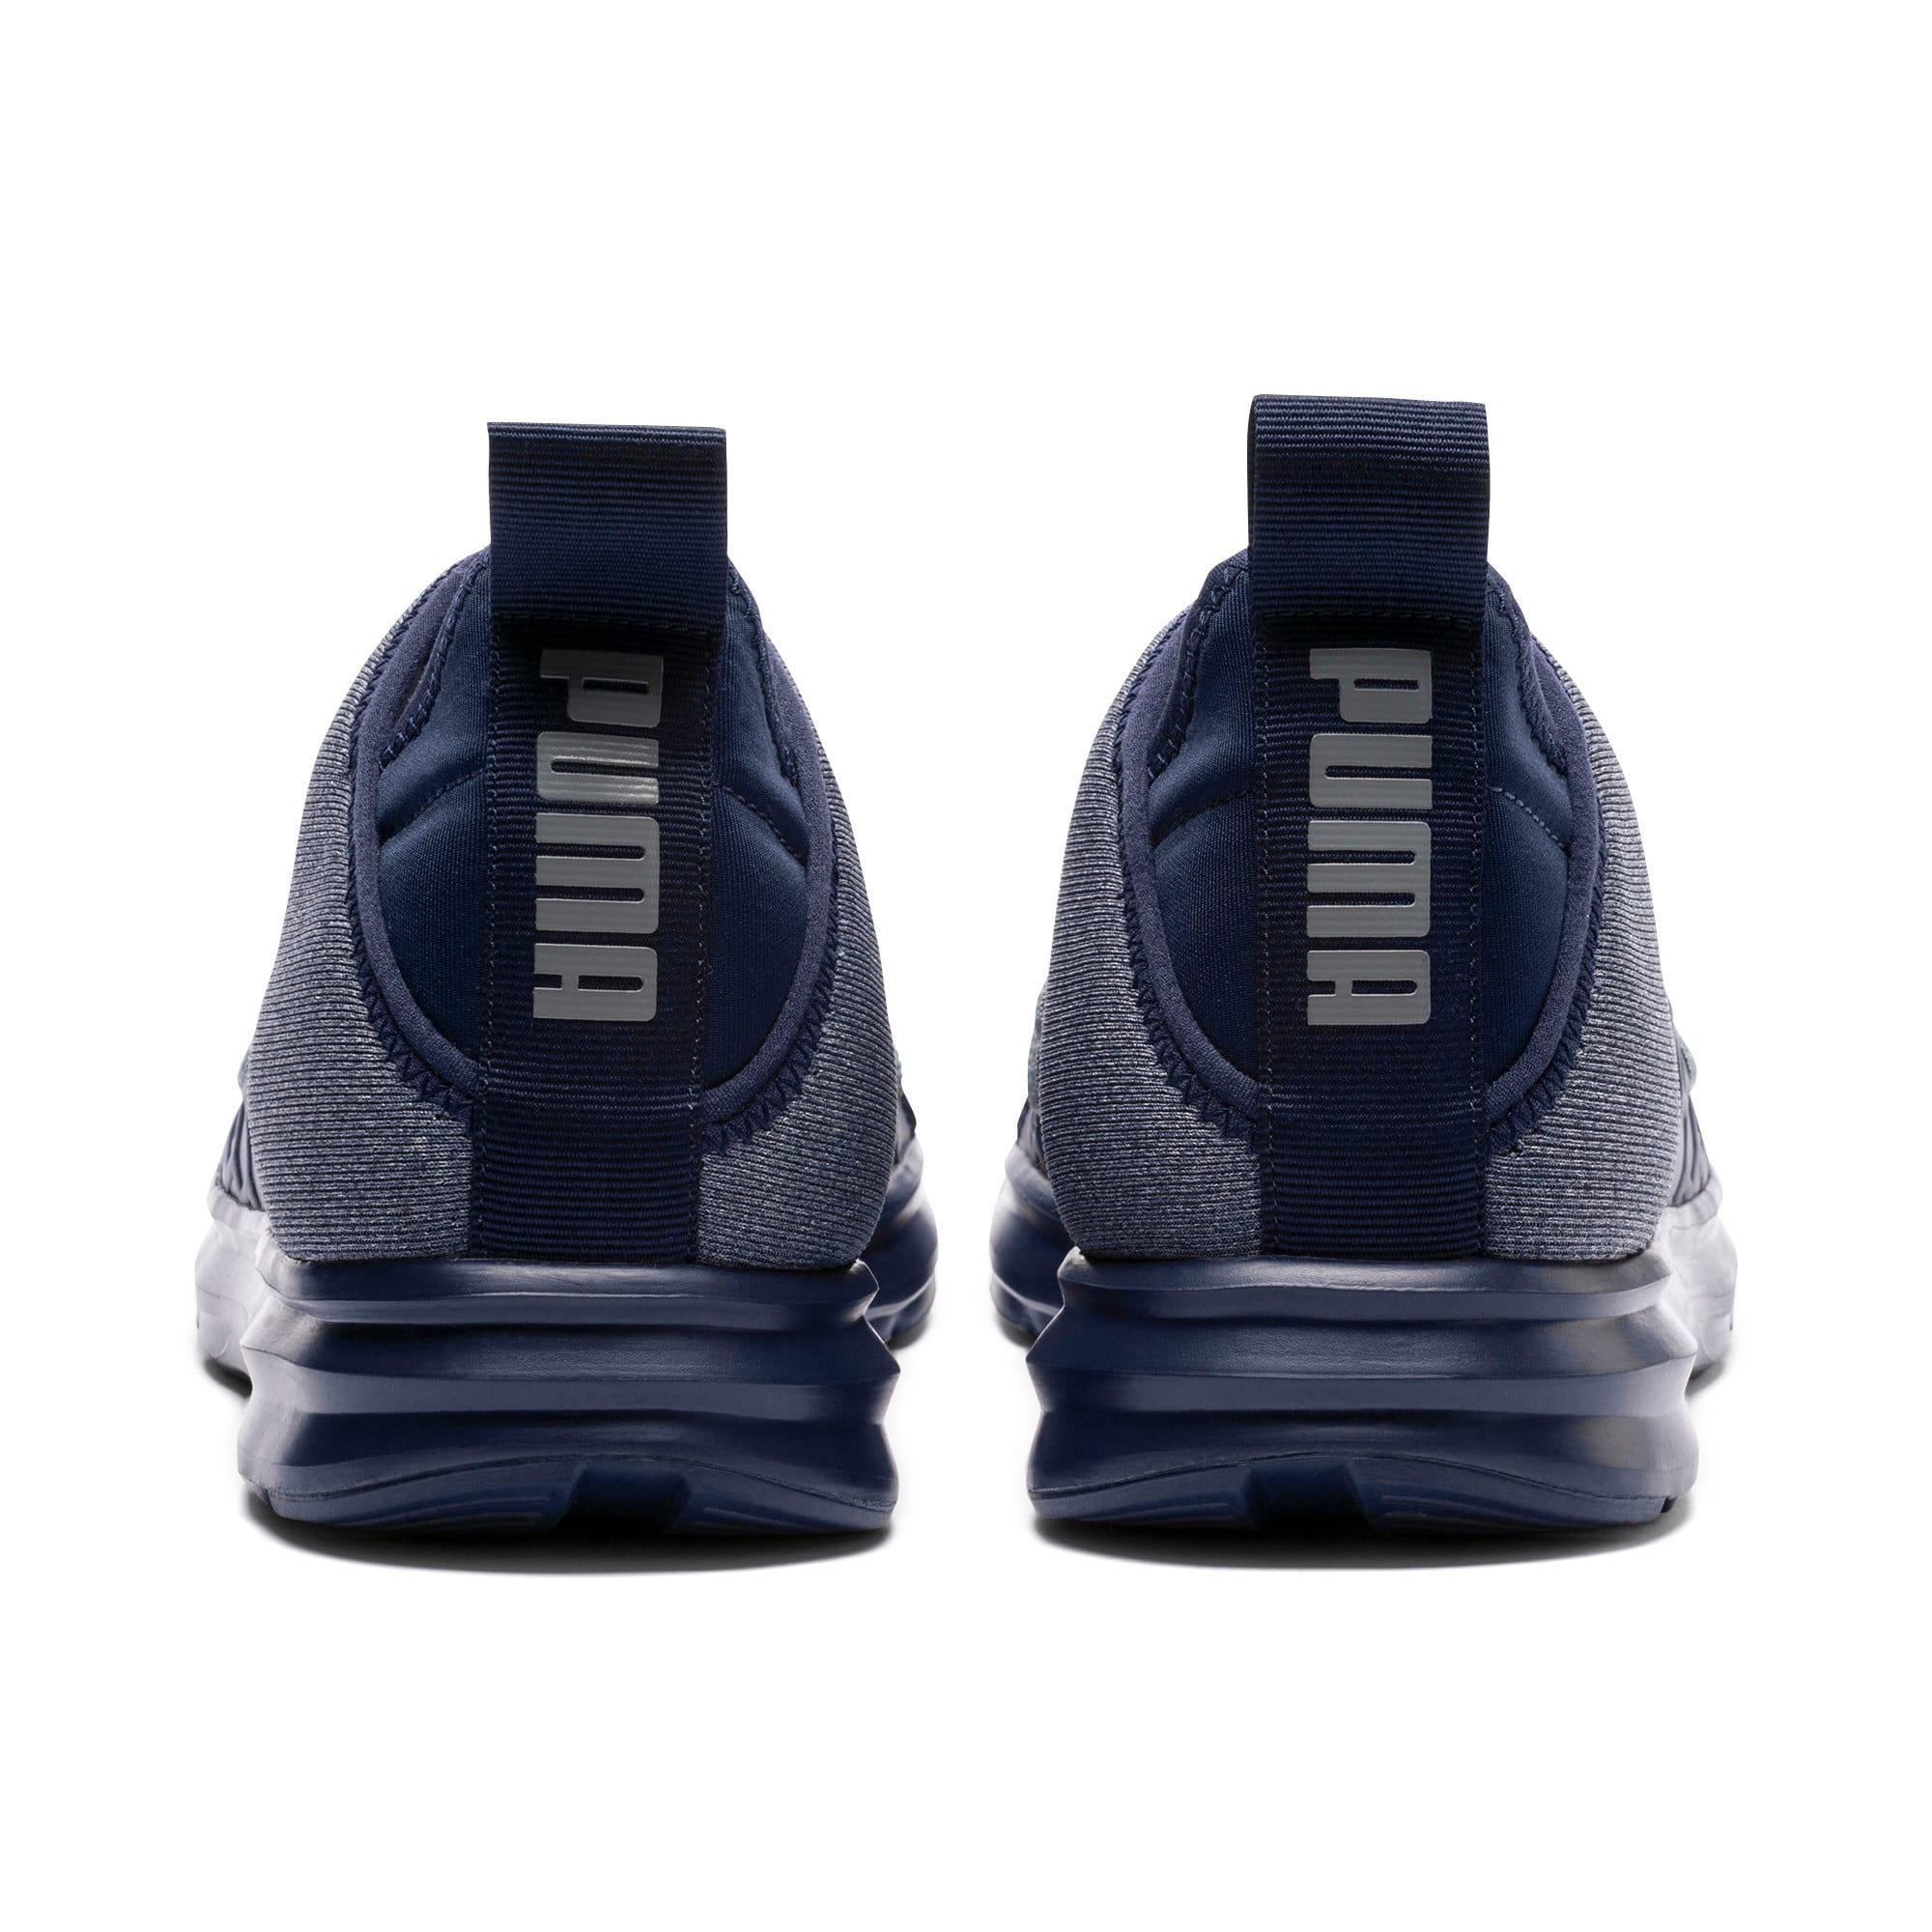 Thumbnail 4 of Enzo NF Mid Men's Training Shoes, Peacoat-Quarry, medium